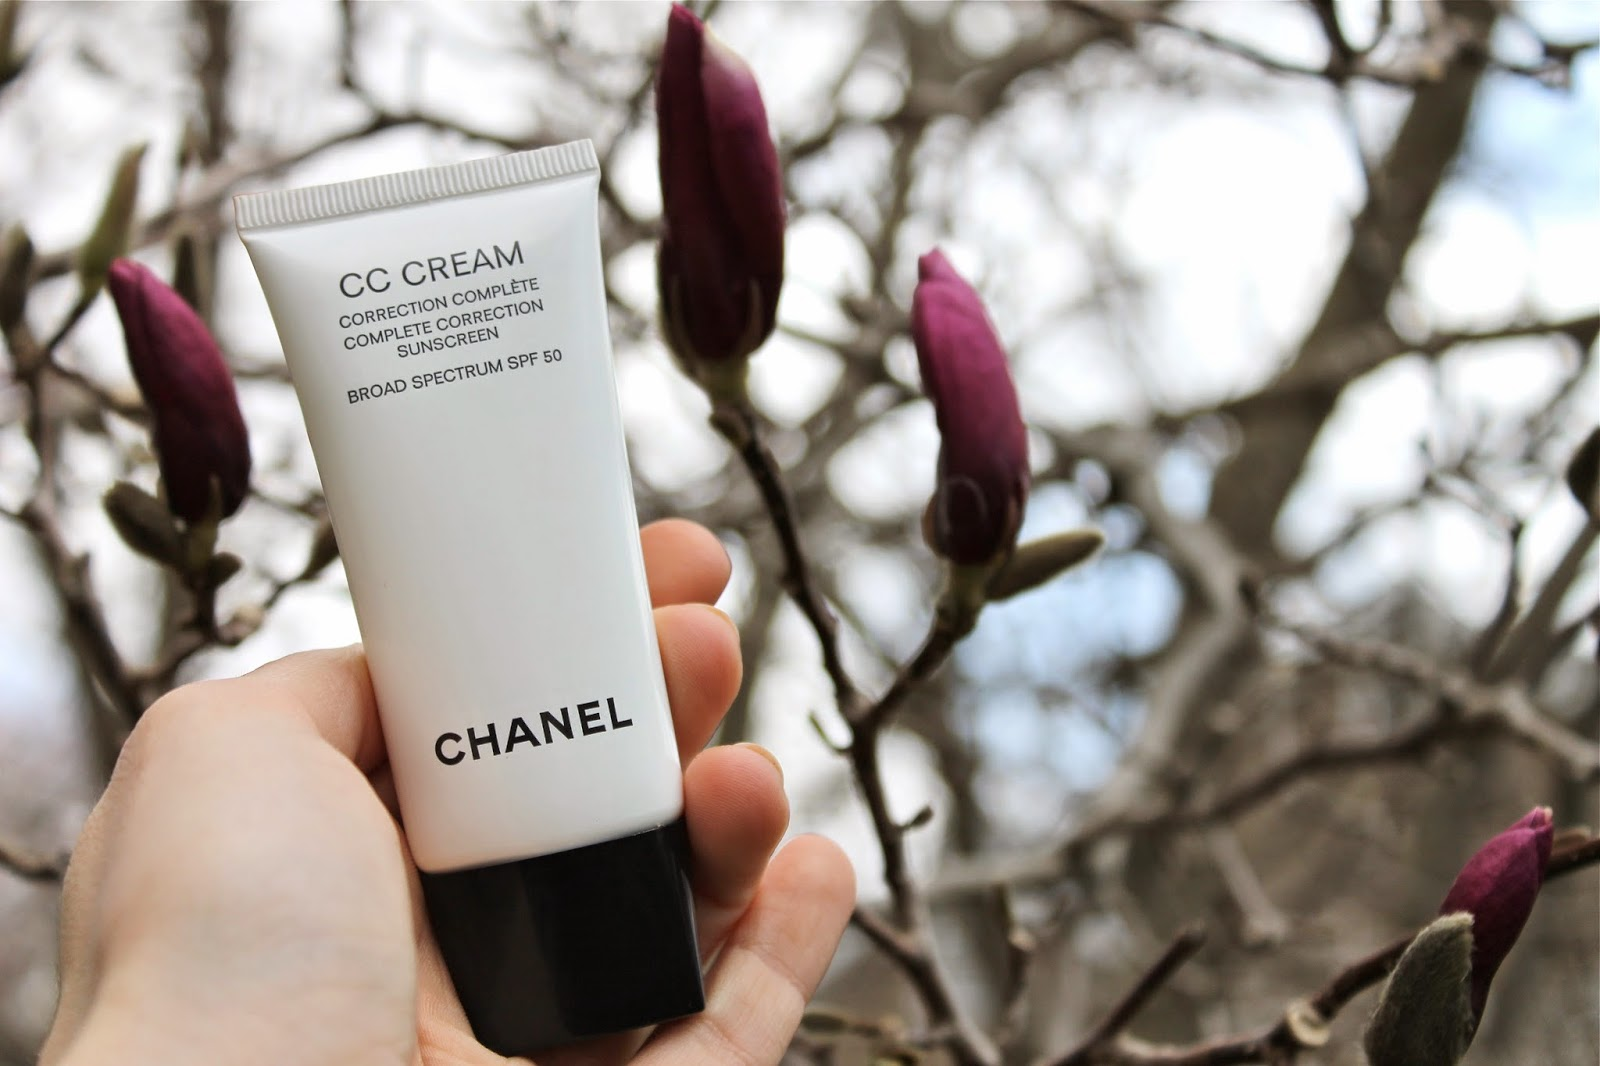 CHANEL CC CREAM: MY NEW BASE LOVE